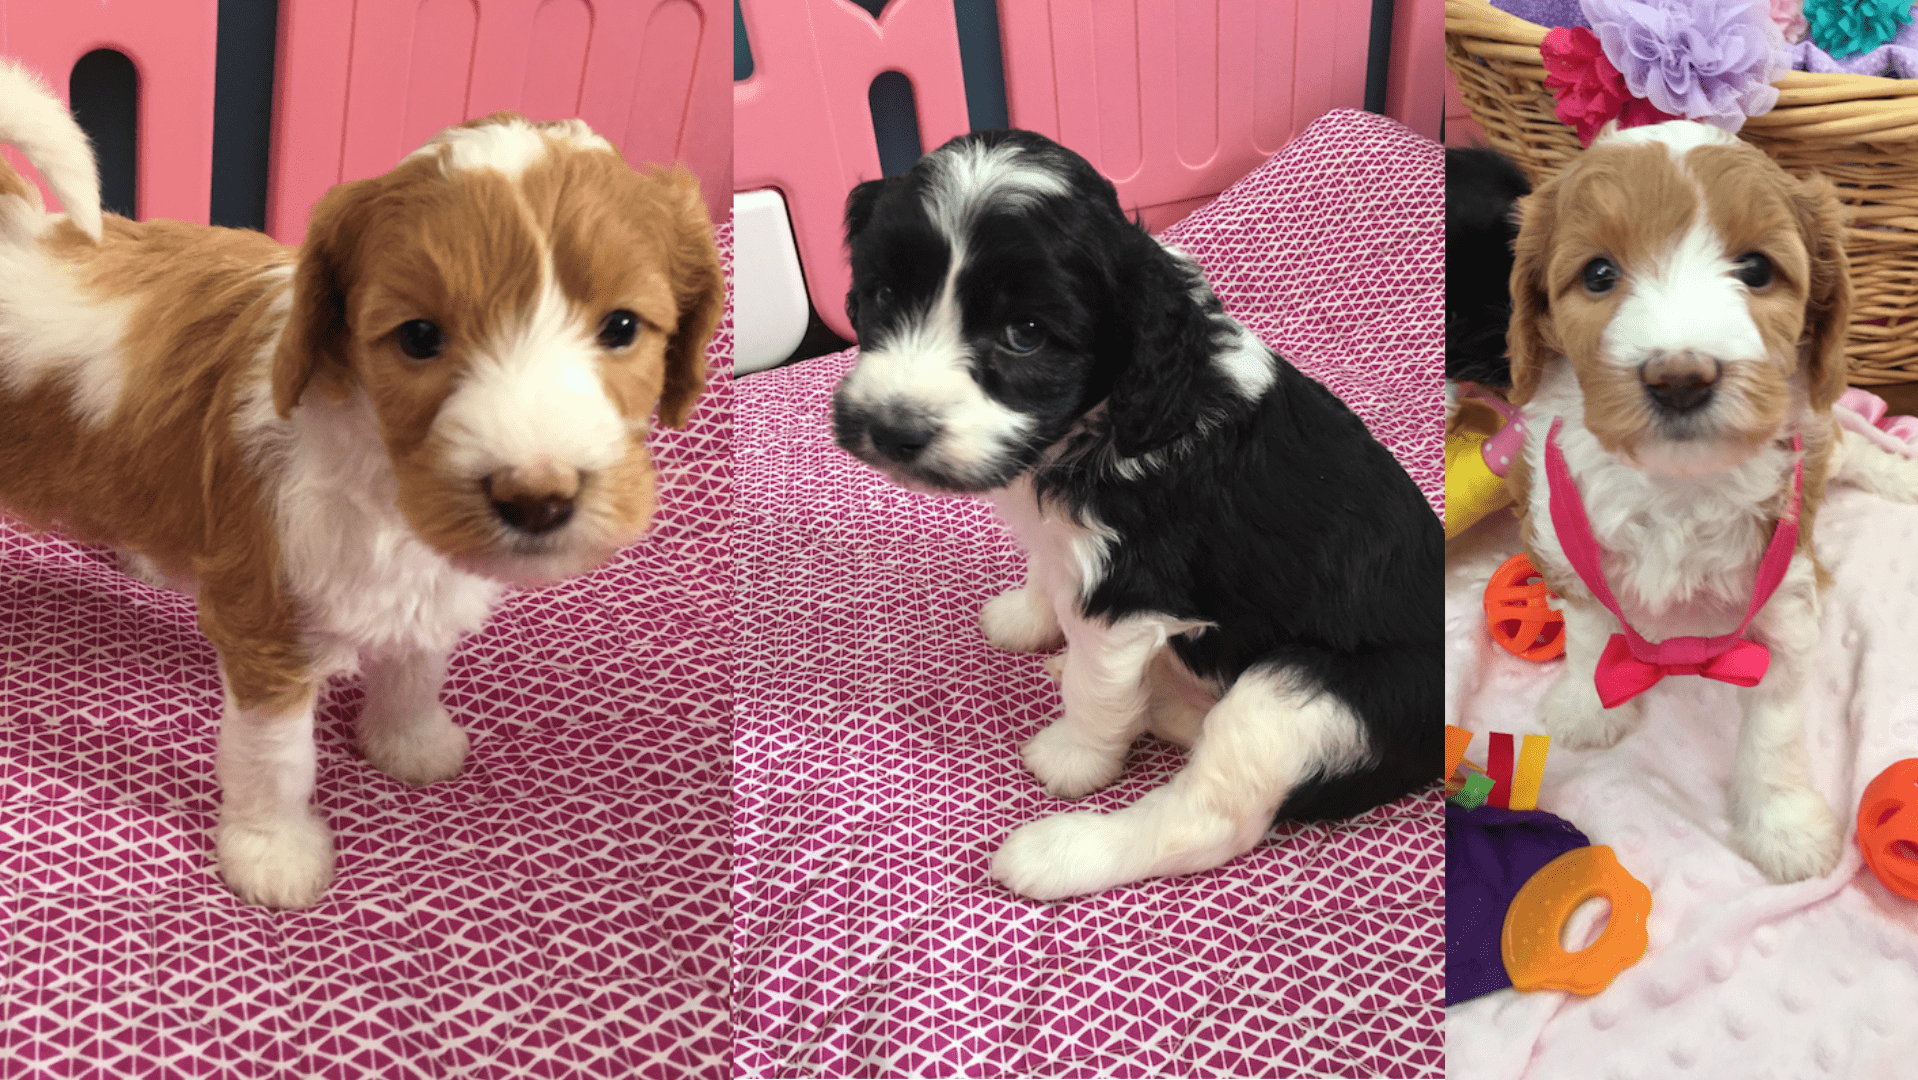 Vito and Brynnley's Puppies (Born Feb 7th)